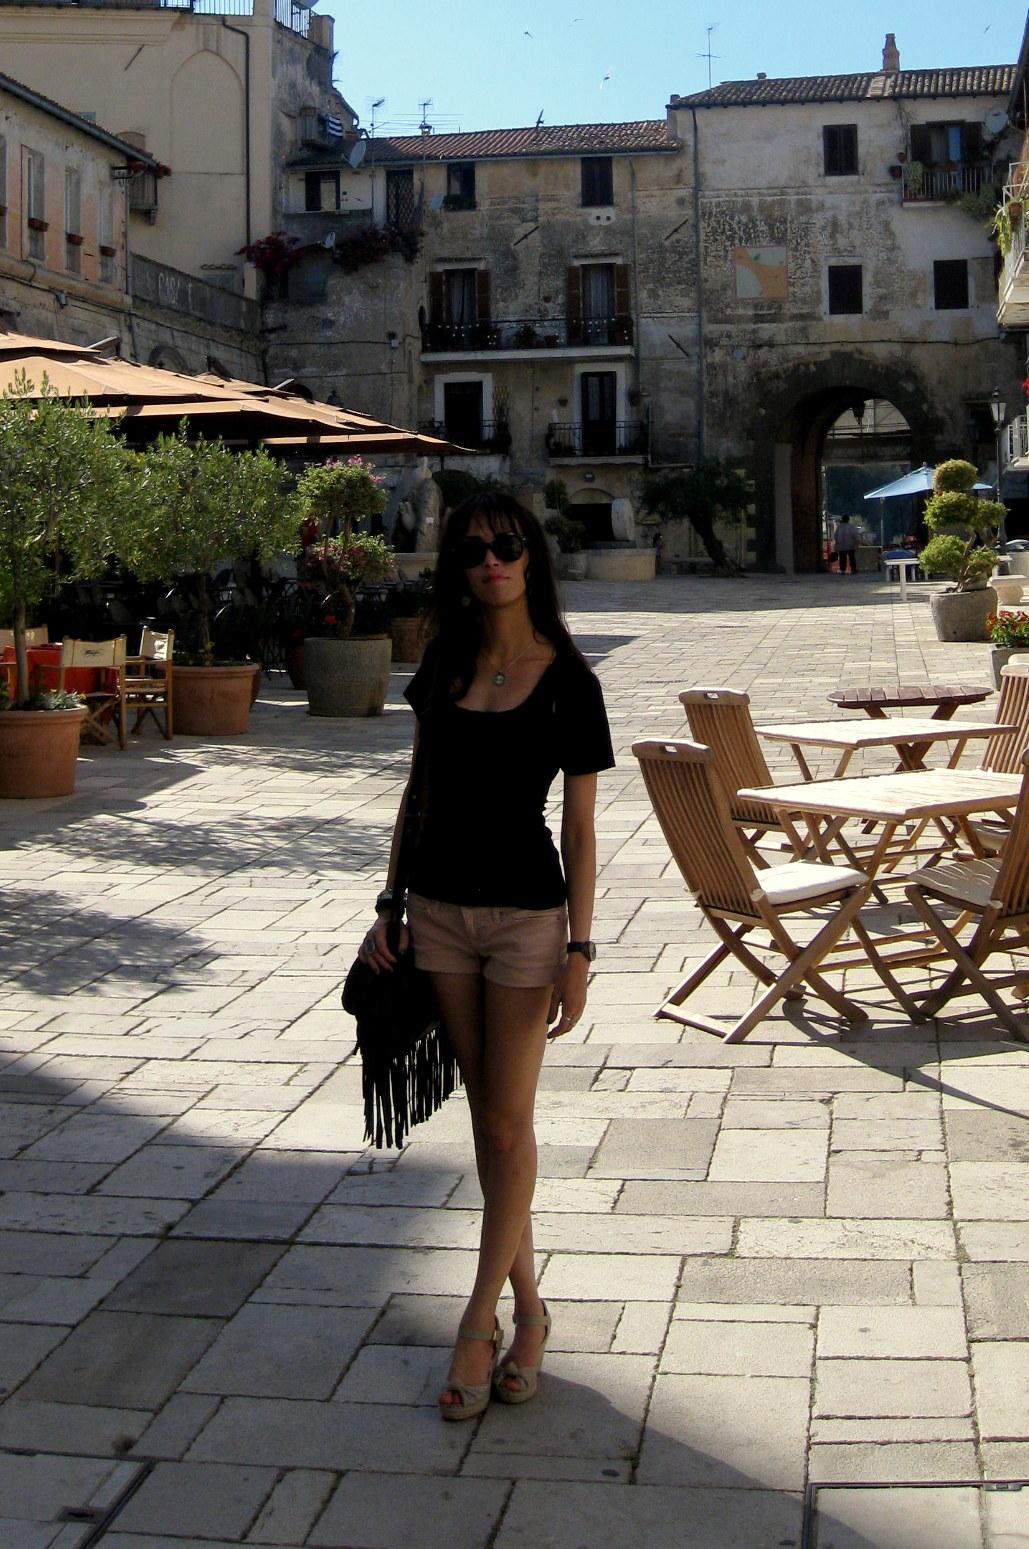 Maria Elene Summer San Felice Circeo And Anzio